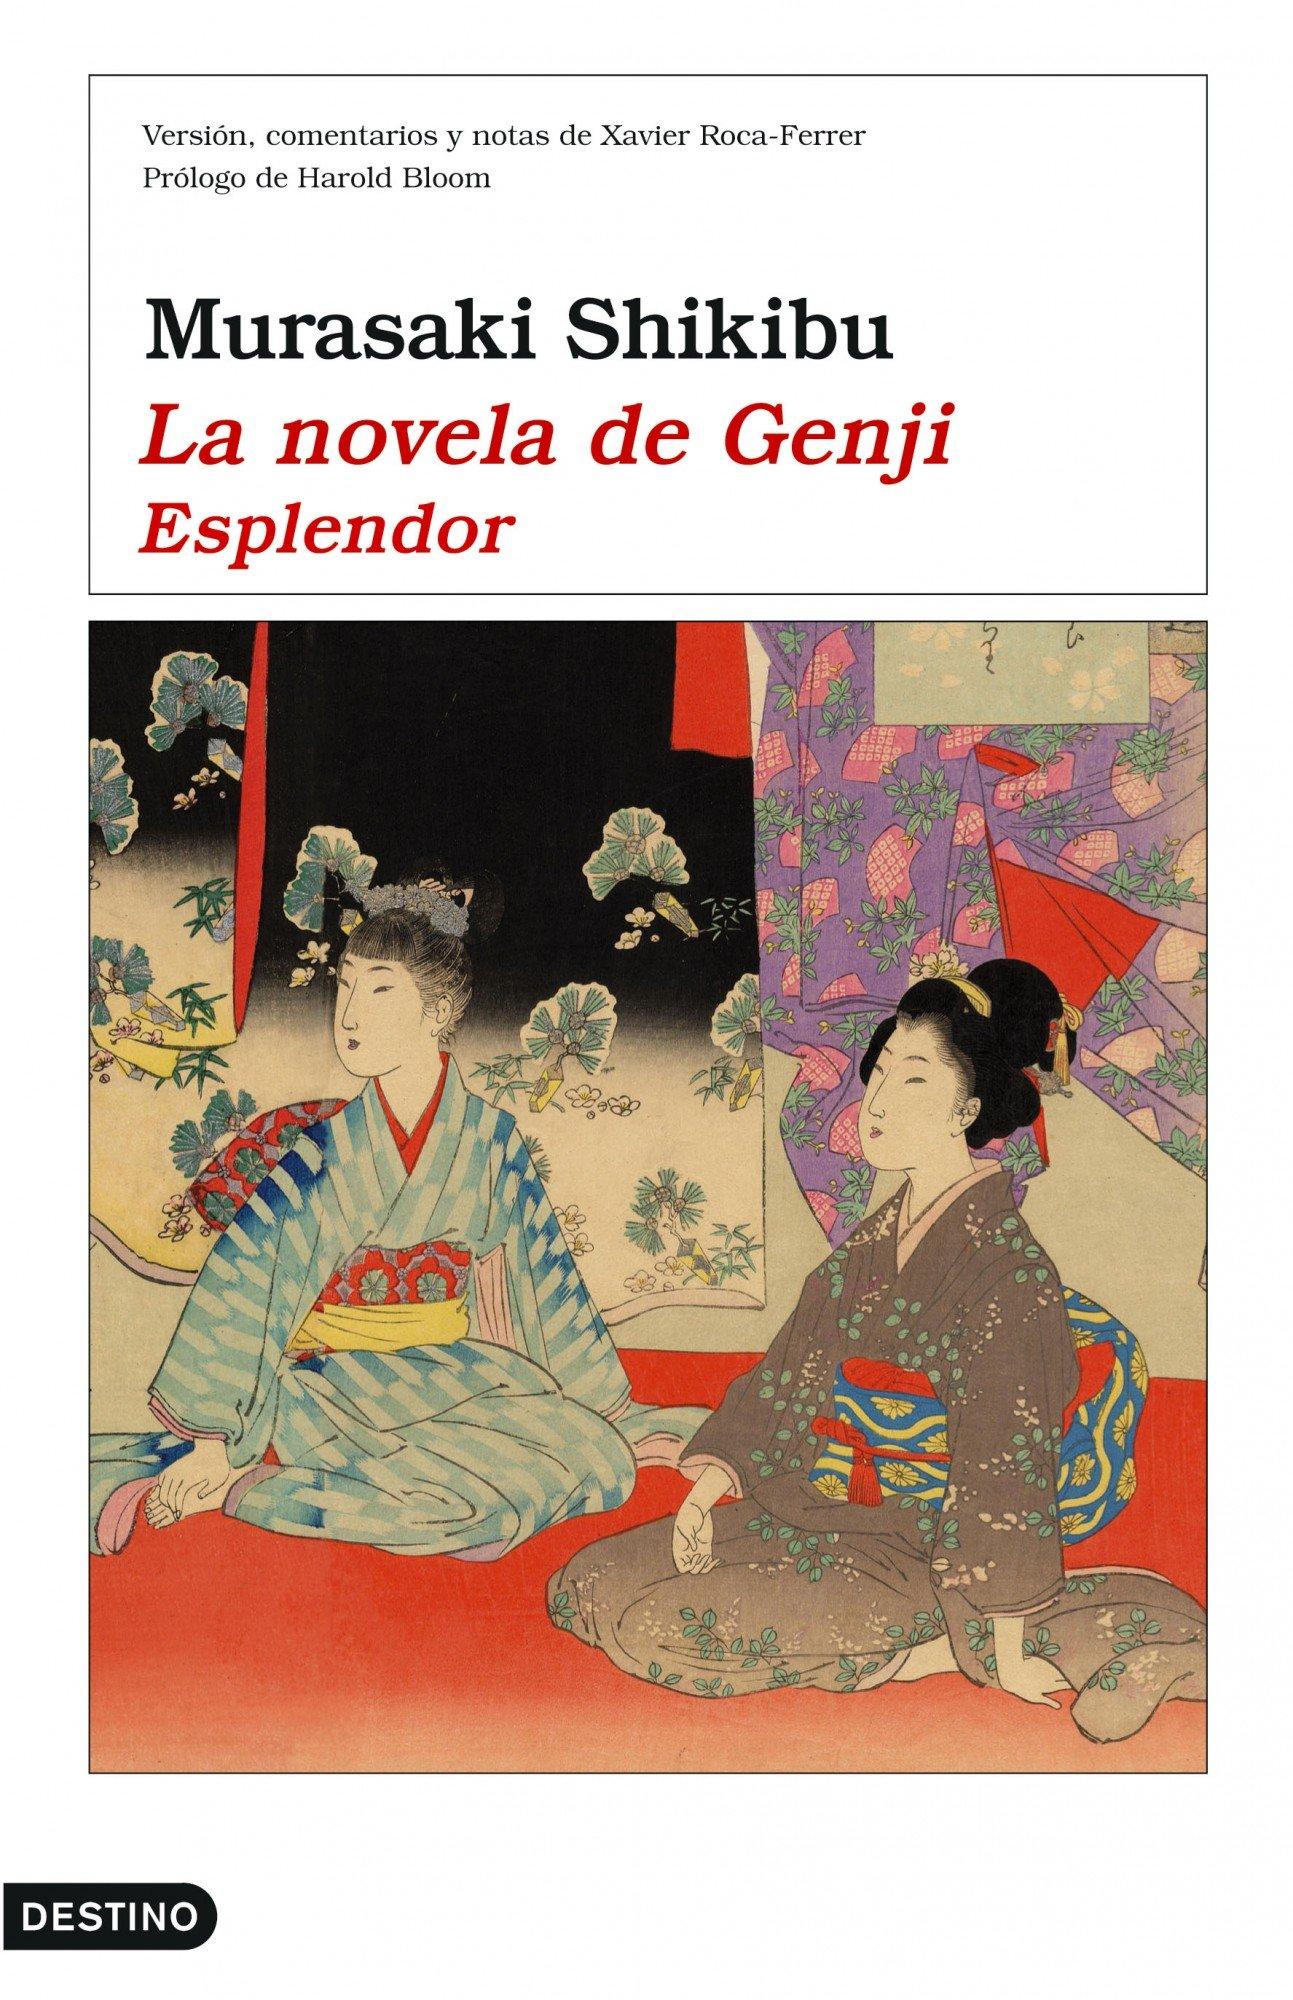 La Novela De Genji I Esplendor By Murasaki Shikibu